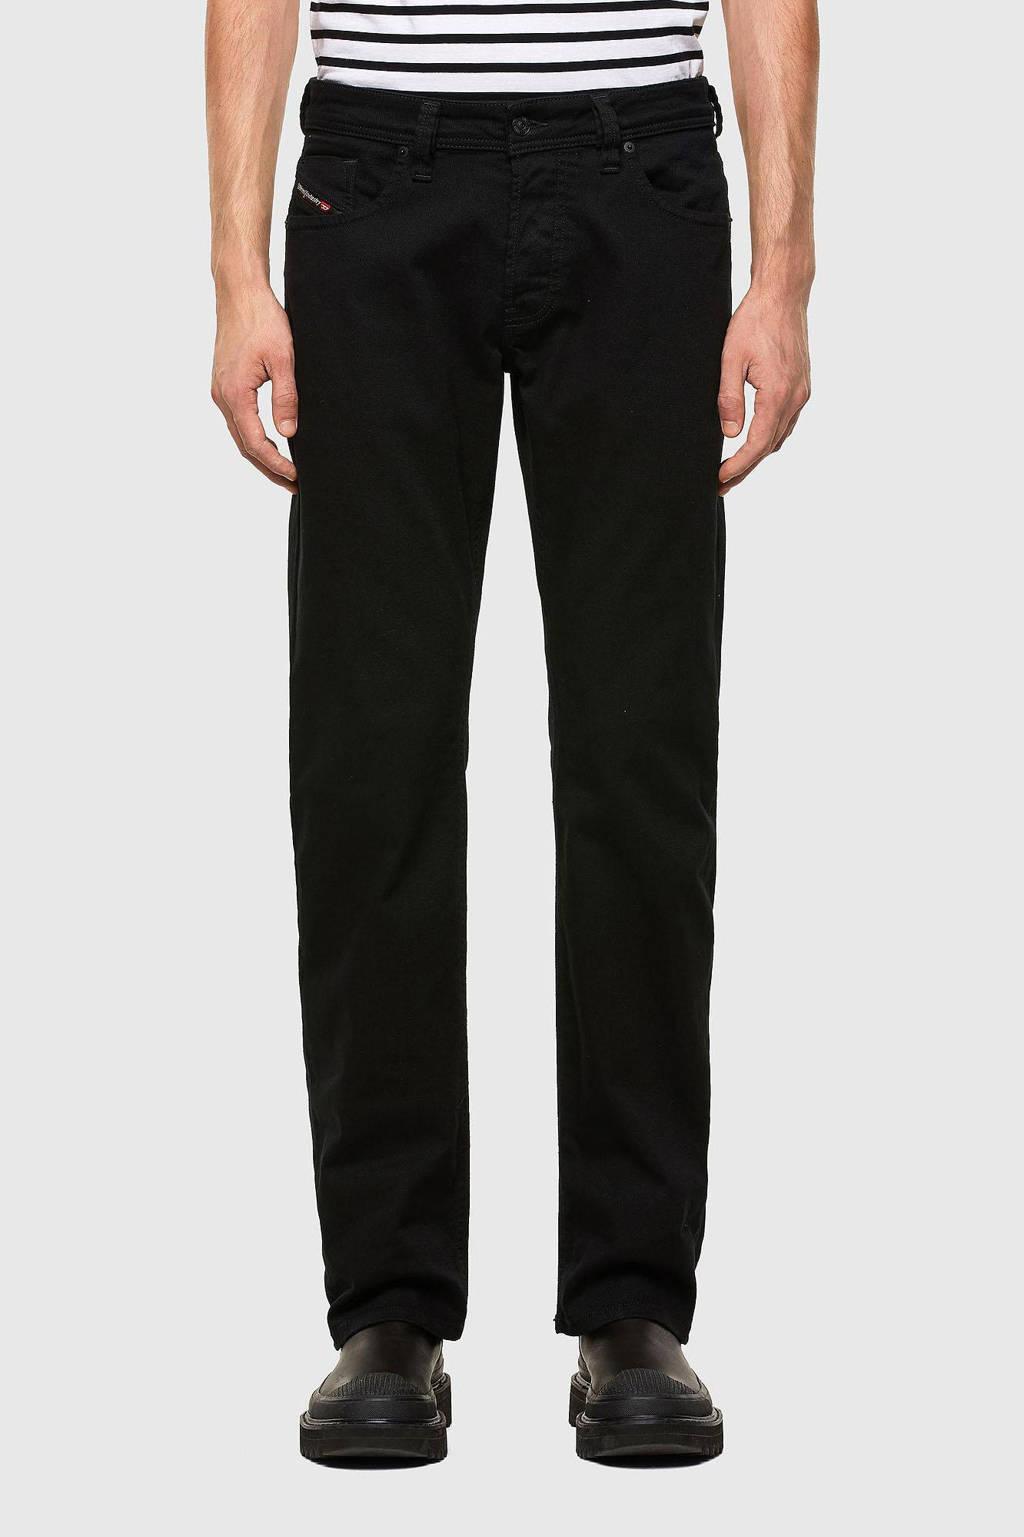 Diesel straight fit jeans Larkee-X 02/ black, 02/ Black